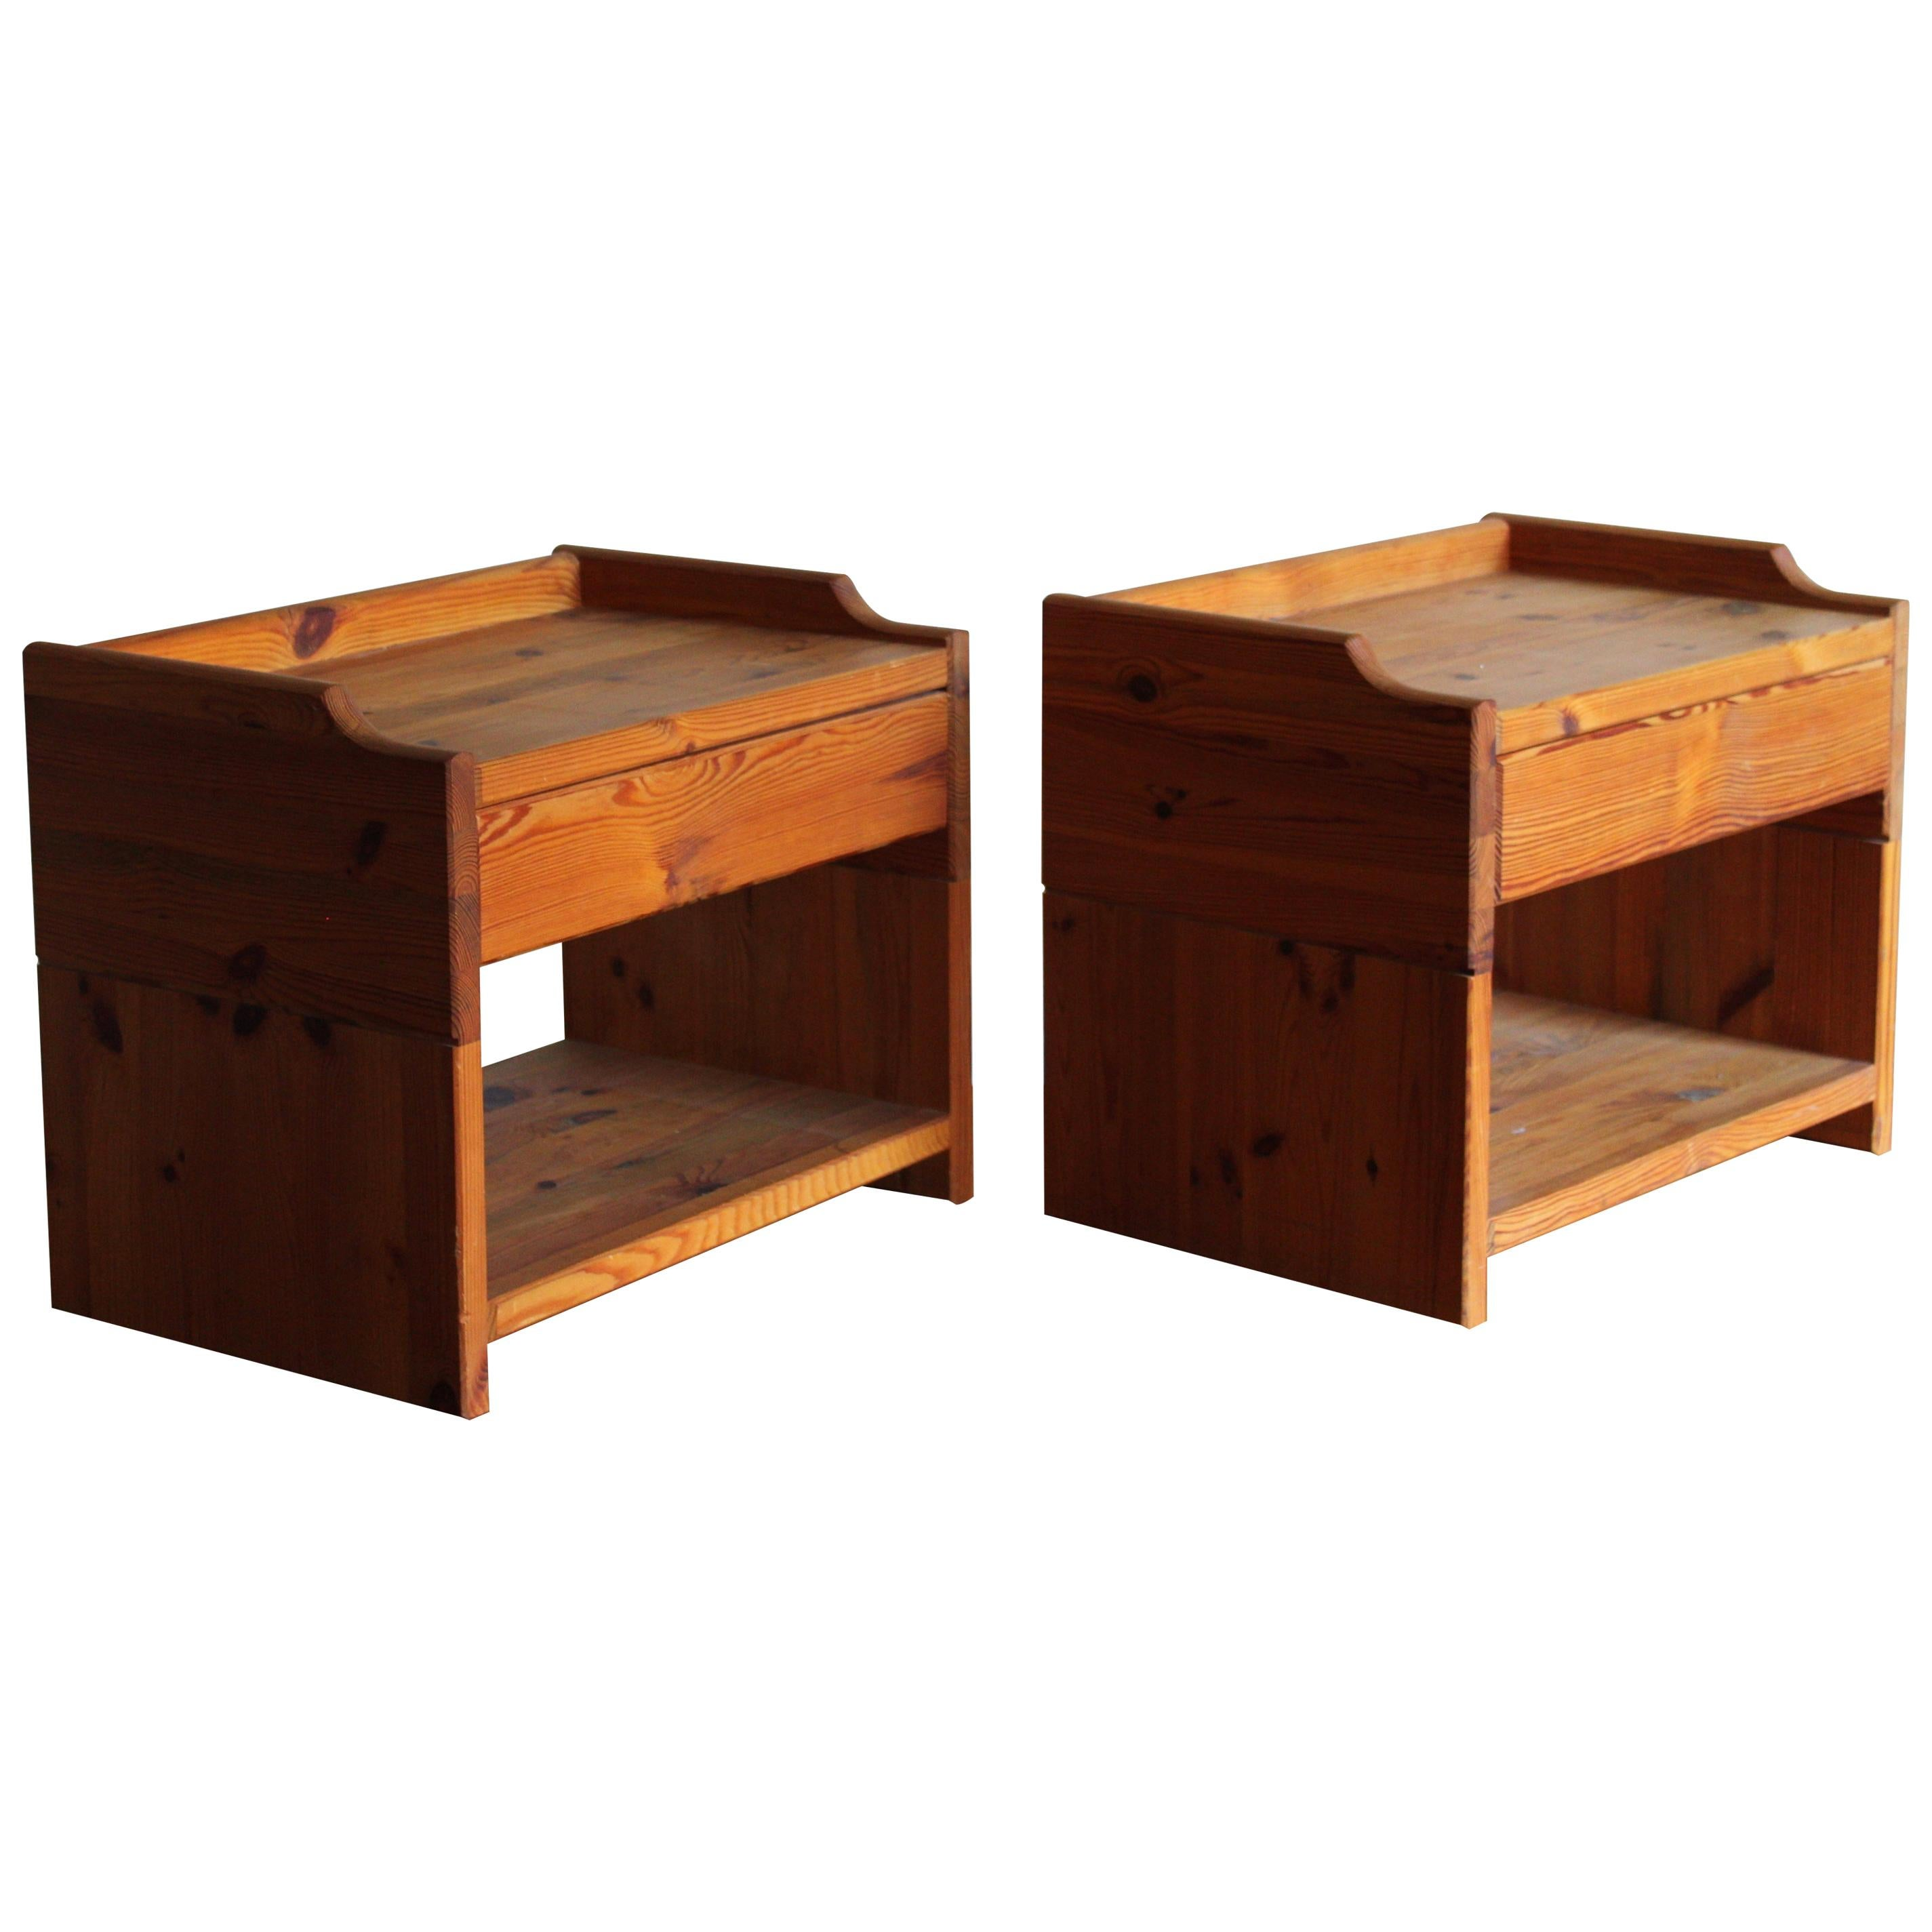 Swedish Designer, Minimalist Bedside Cabinets, Solid Stained Pine, Sweden, 1970s